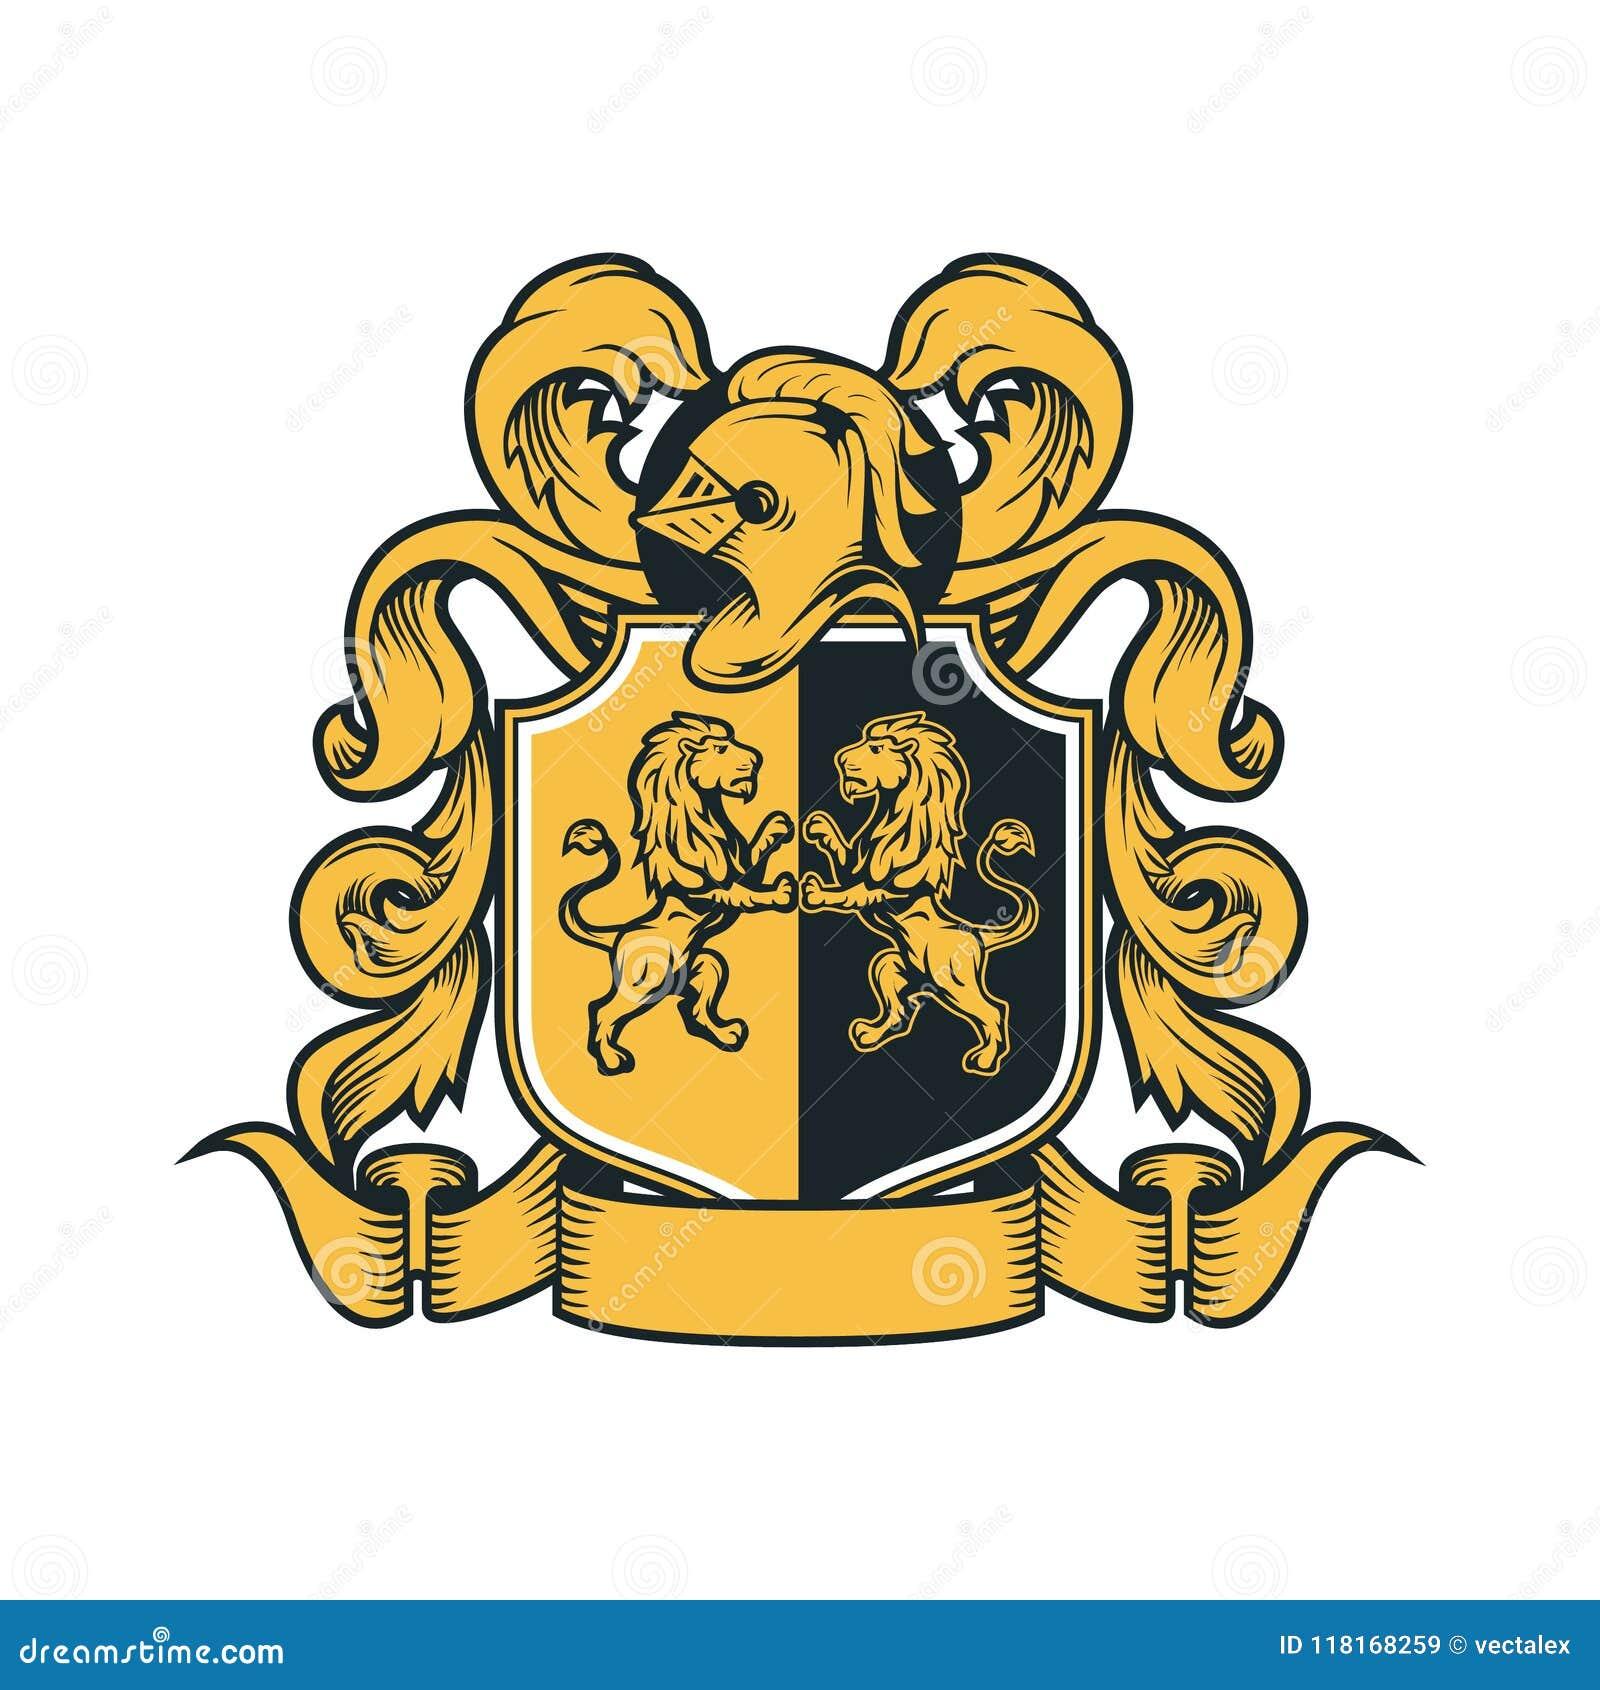 Coat Arms Vintage Knight Royal Family Crest Heraldic Emblem